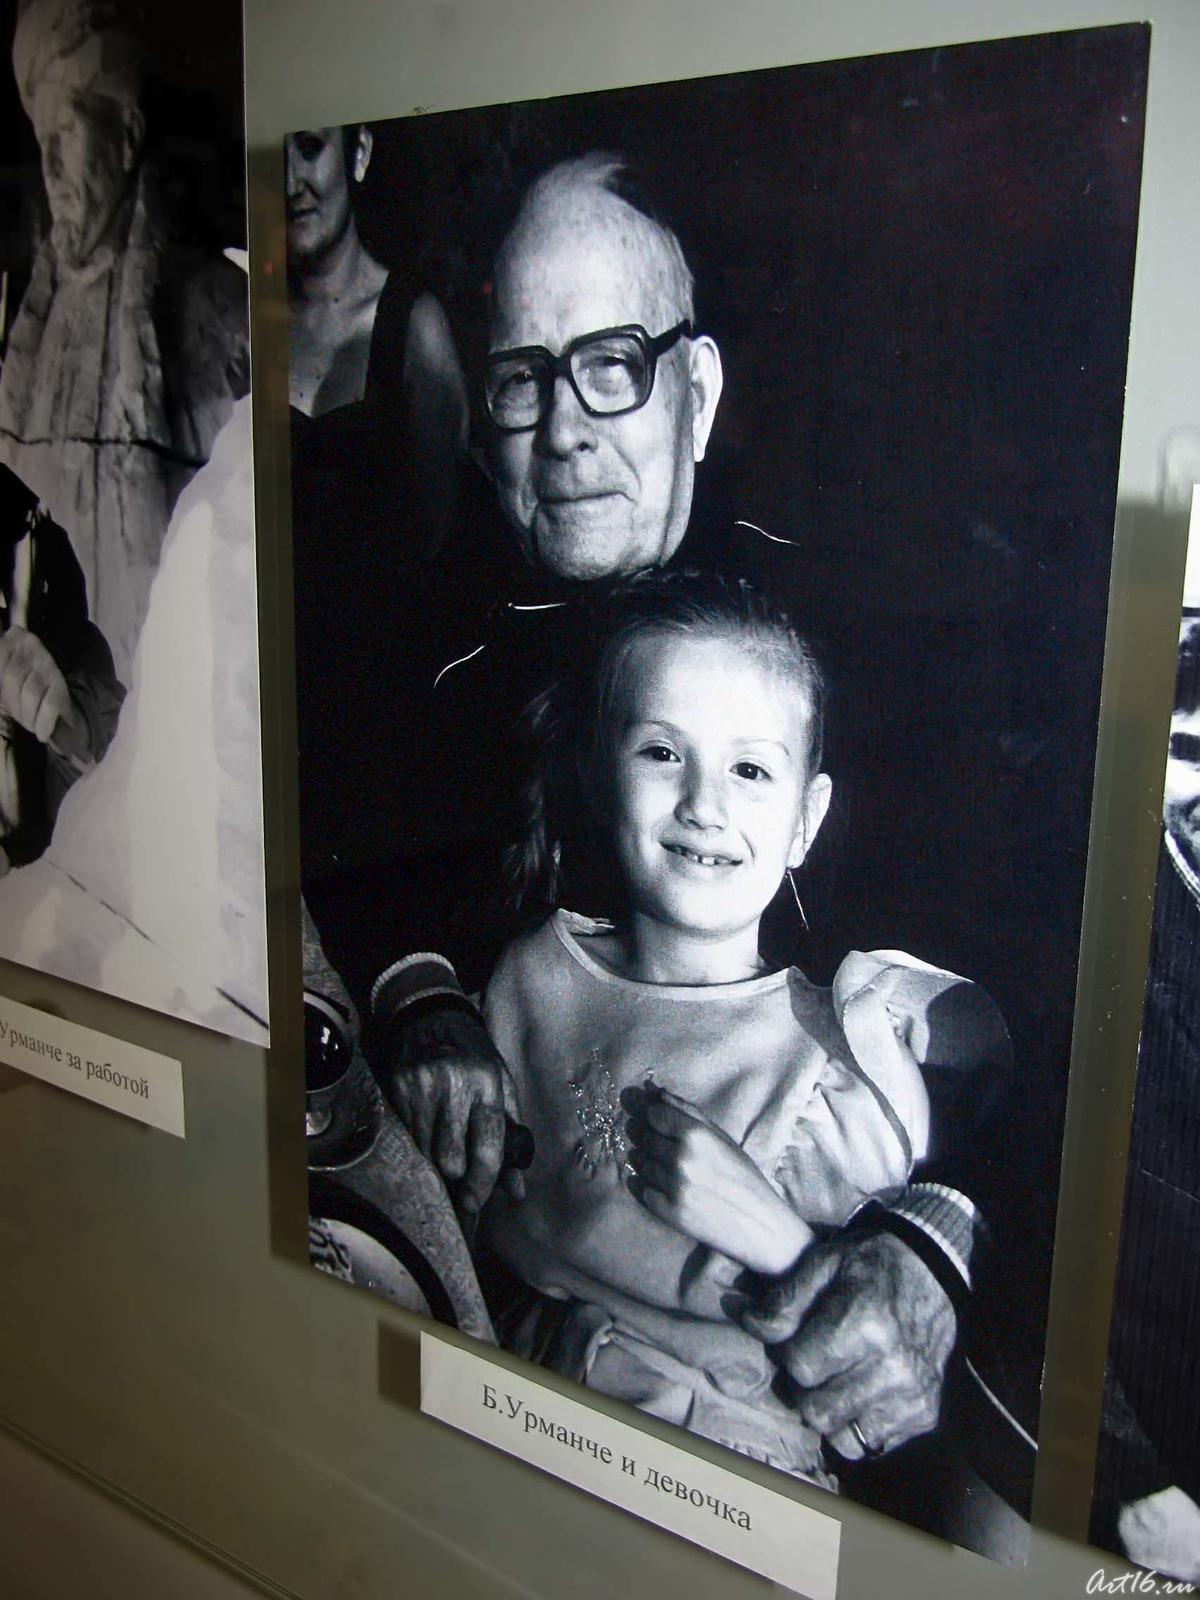 Фото №43511. Б. Урманче и девочка